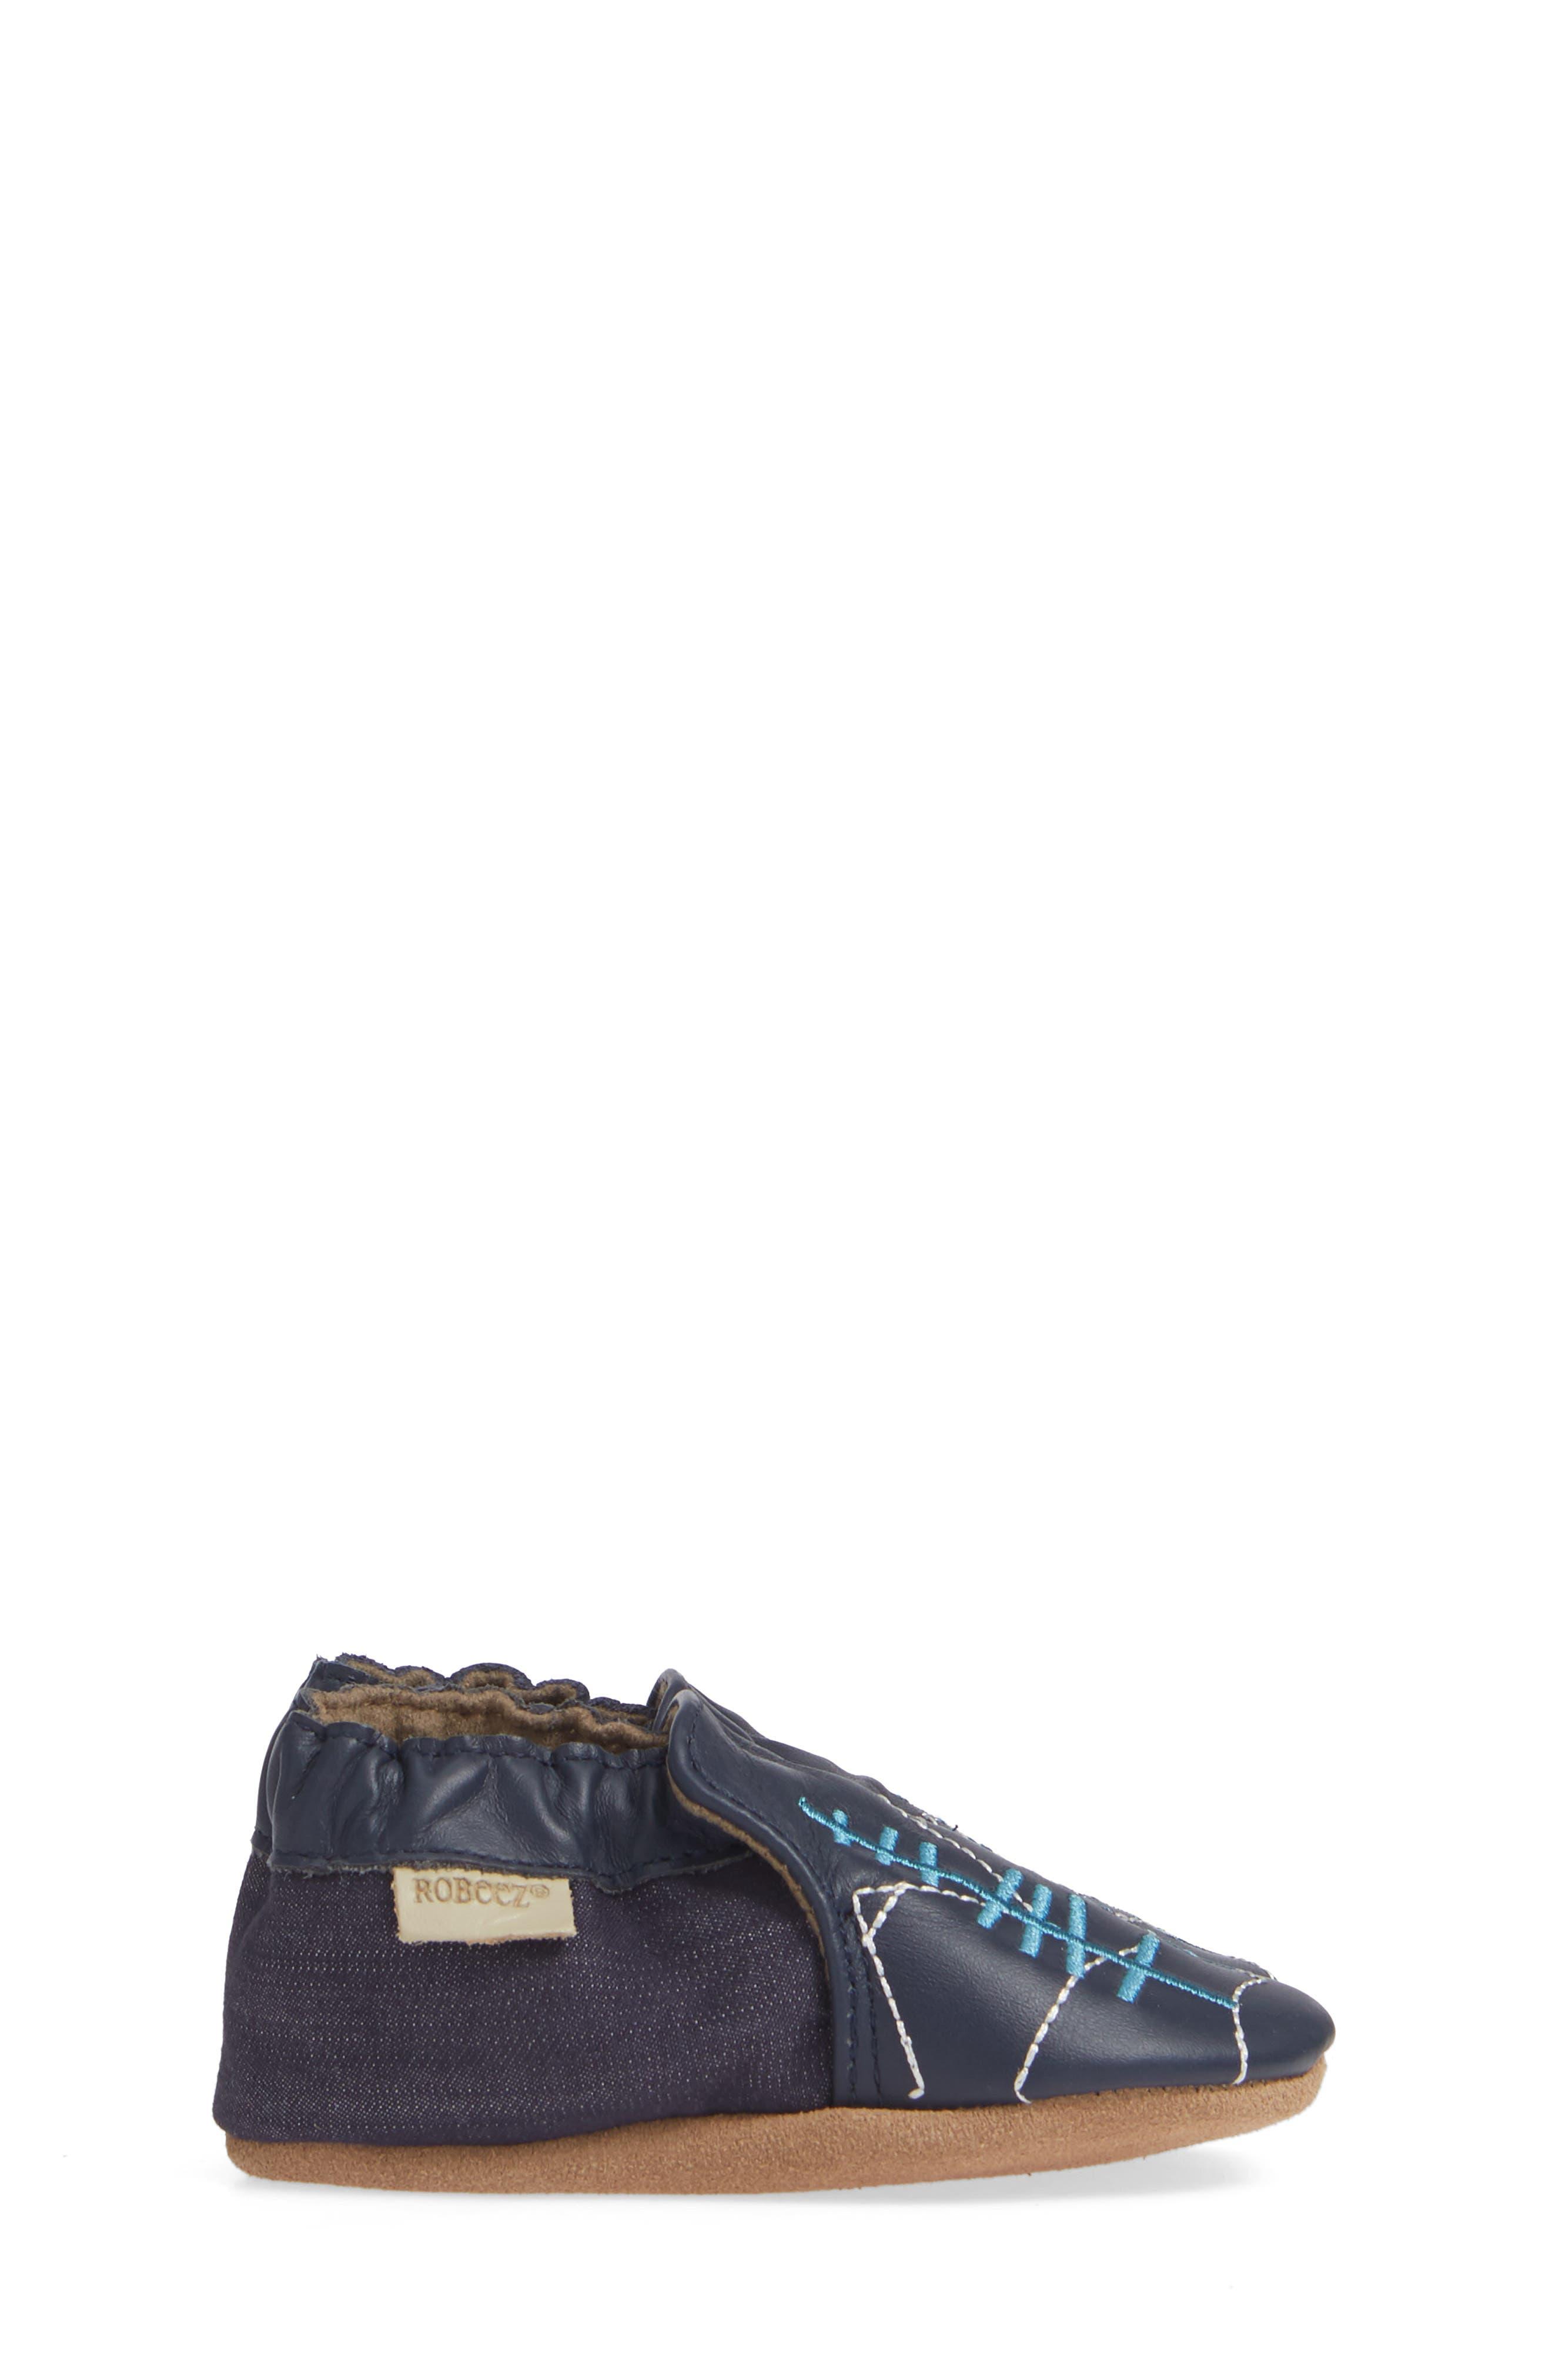 ROBEEZ<SUP>®</SUP>, Mountain Explorer Moccasin Crib Shoe, Alternate thumbnail 4, color, NAVY